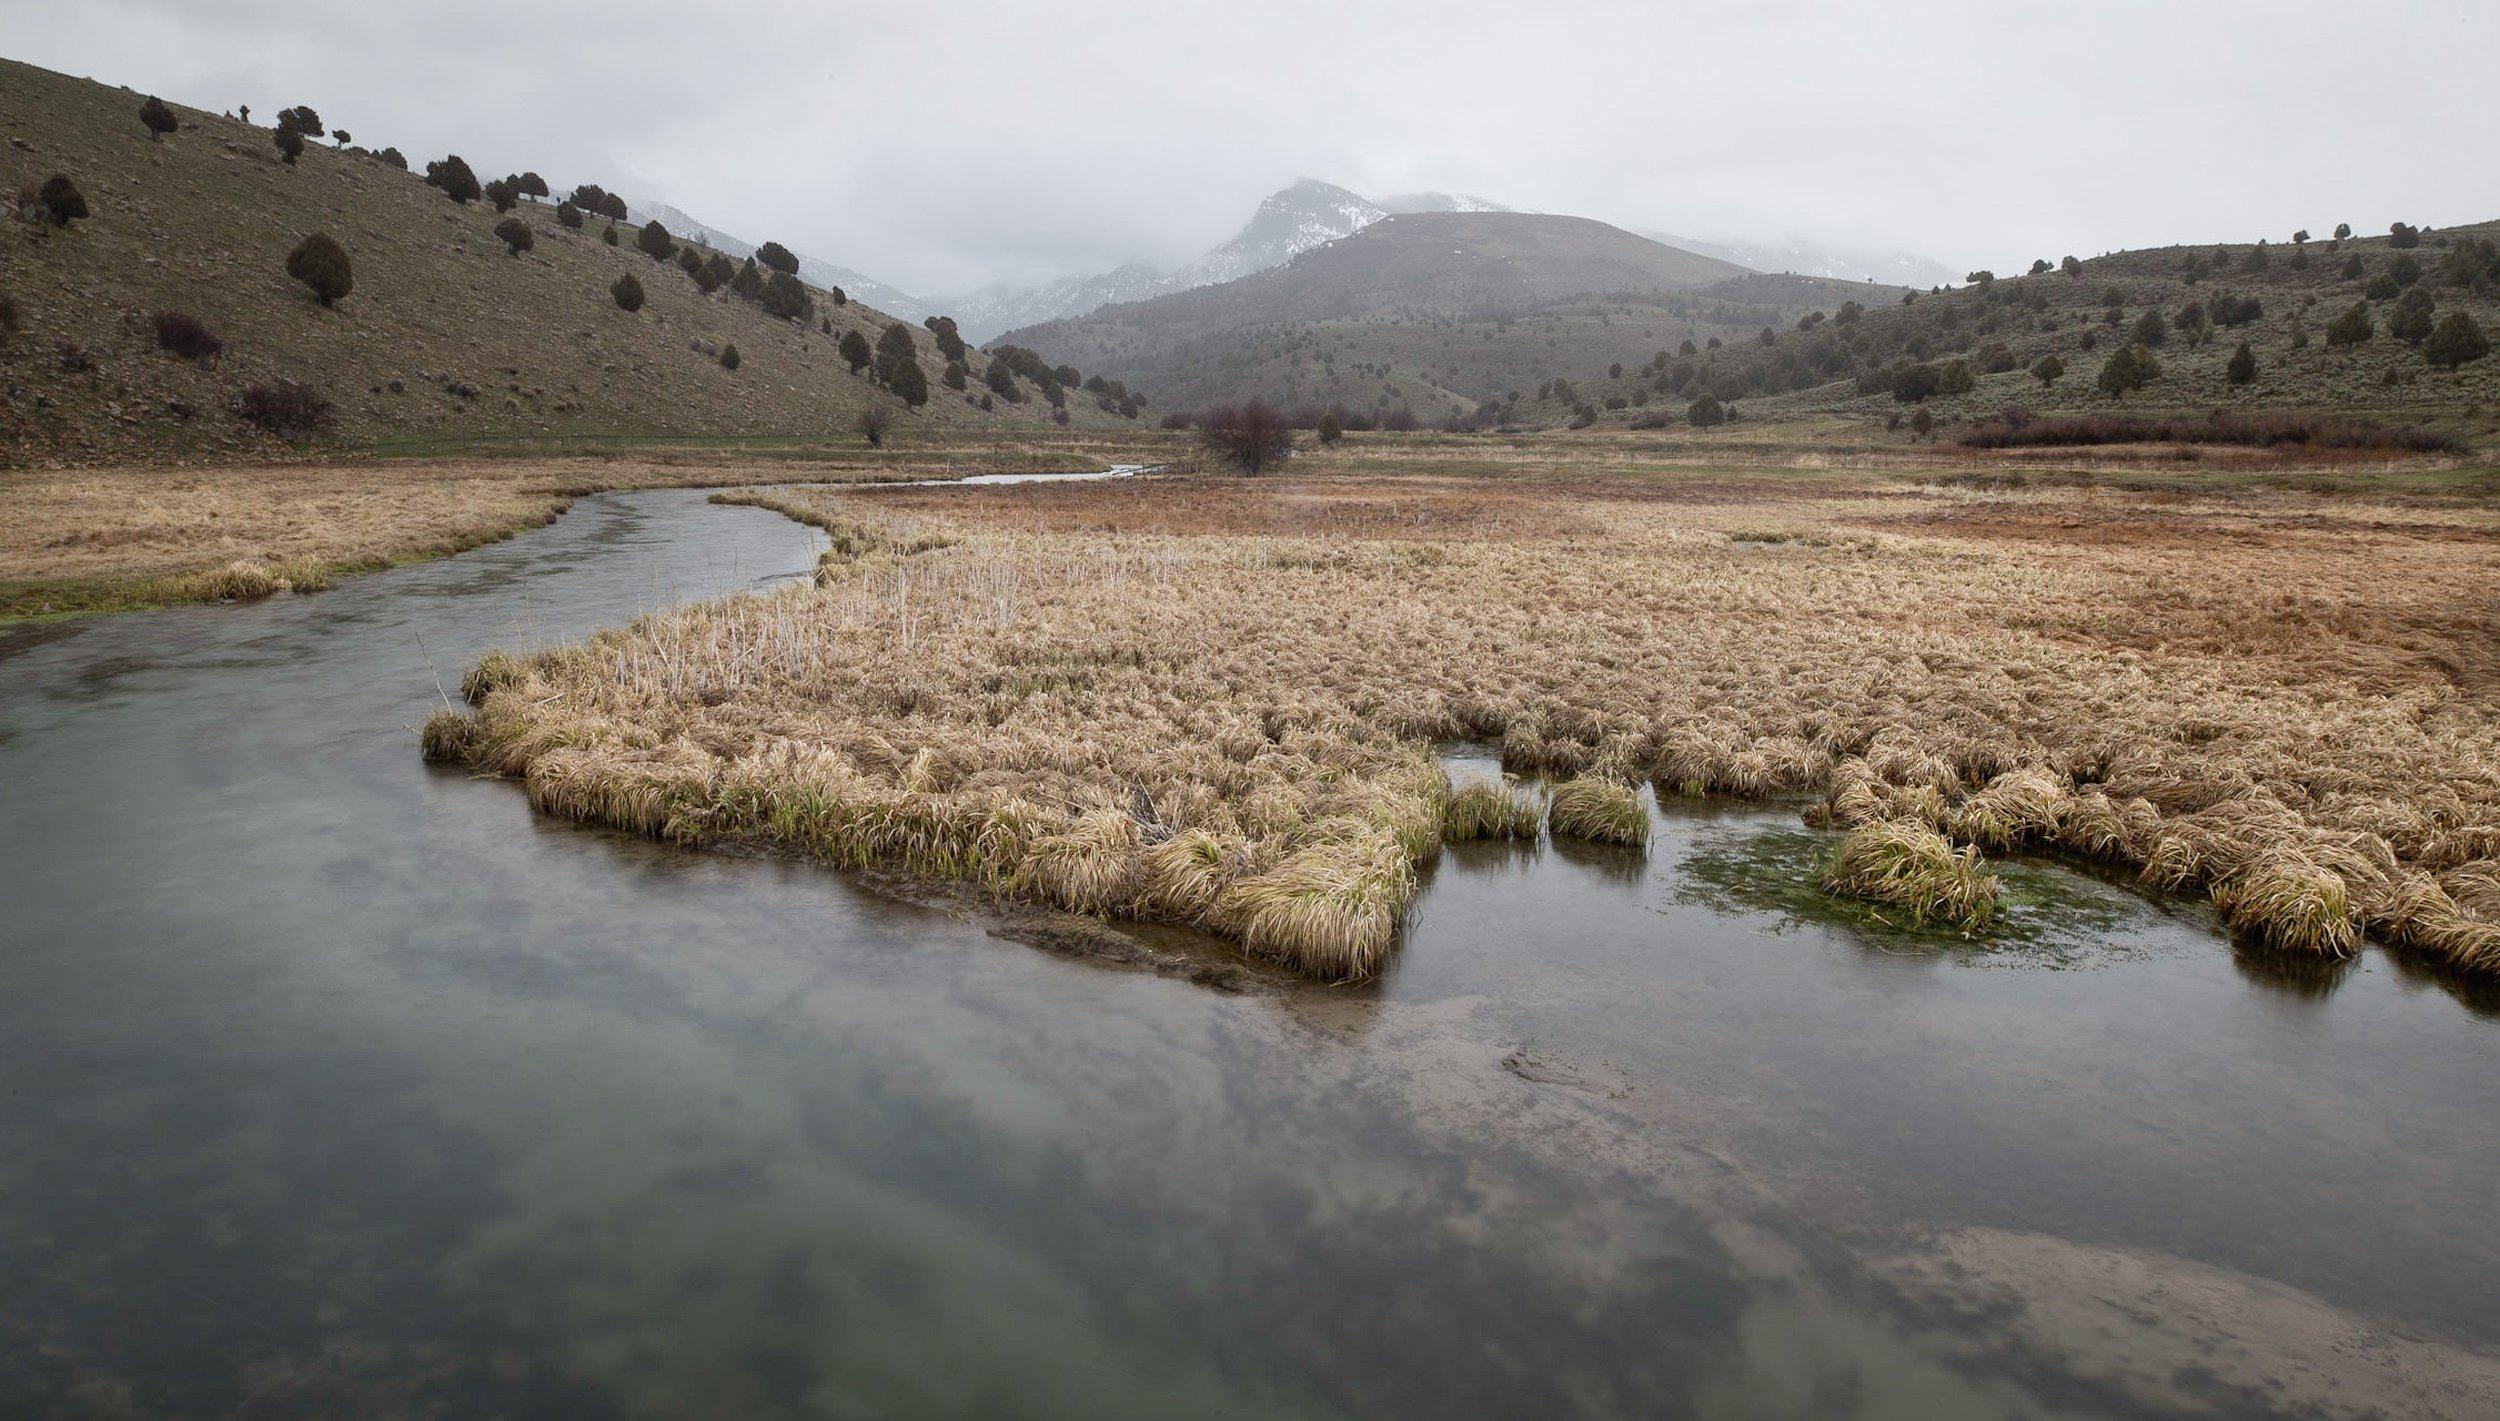 Blacksmith Fork River, Utah 2018